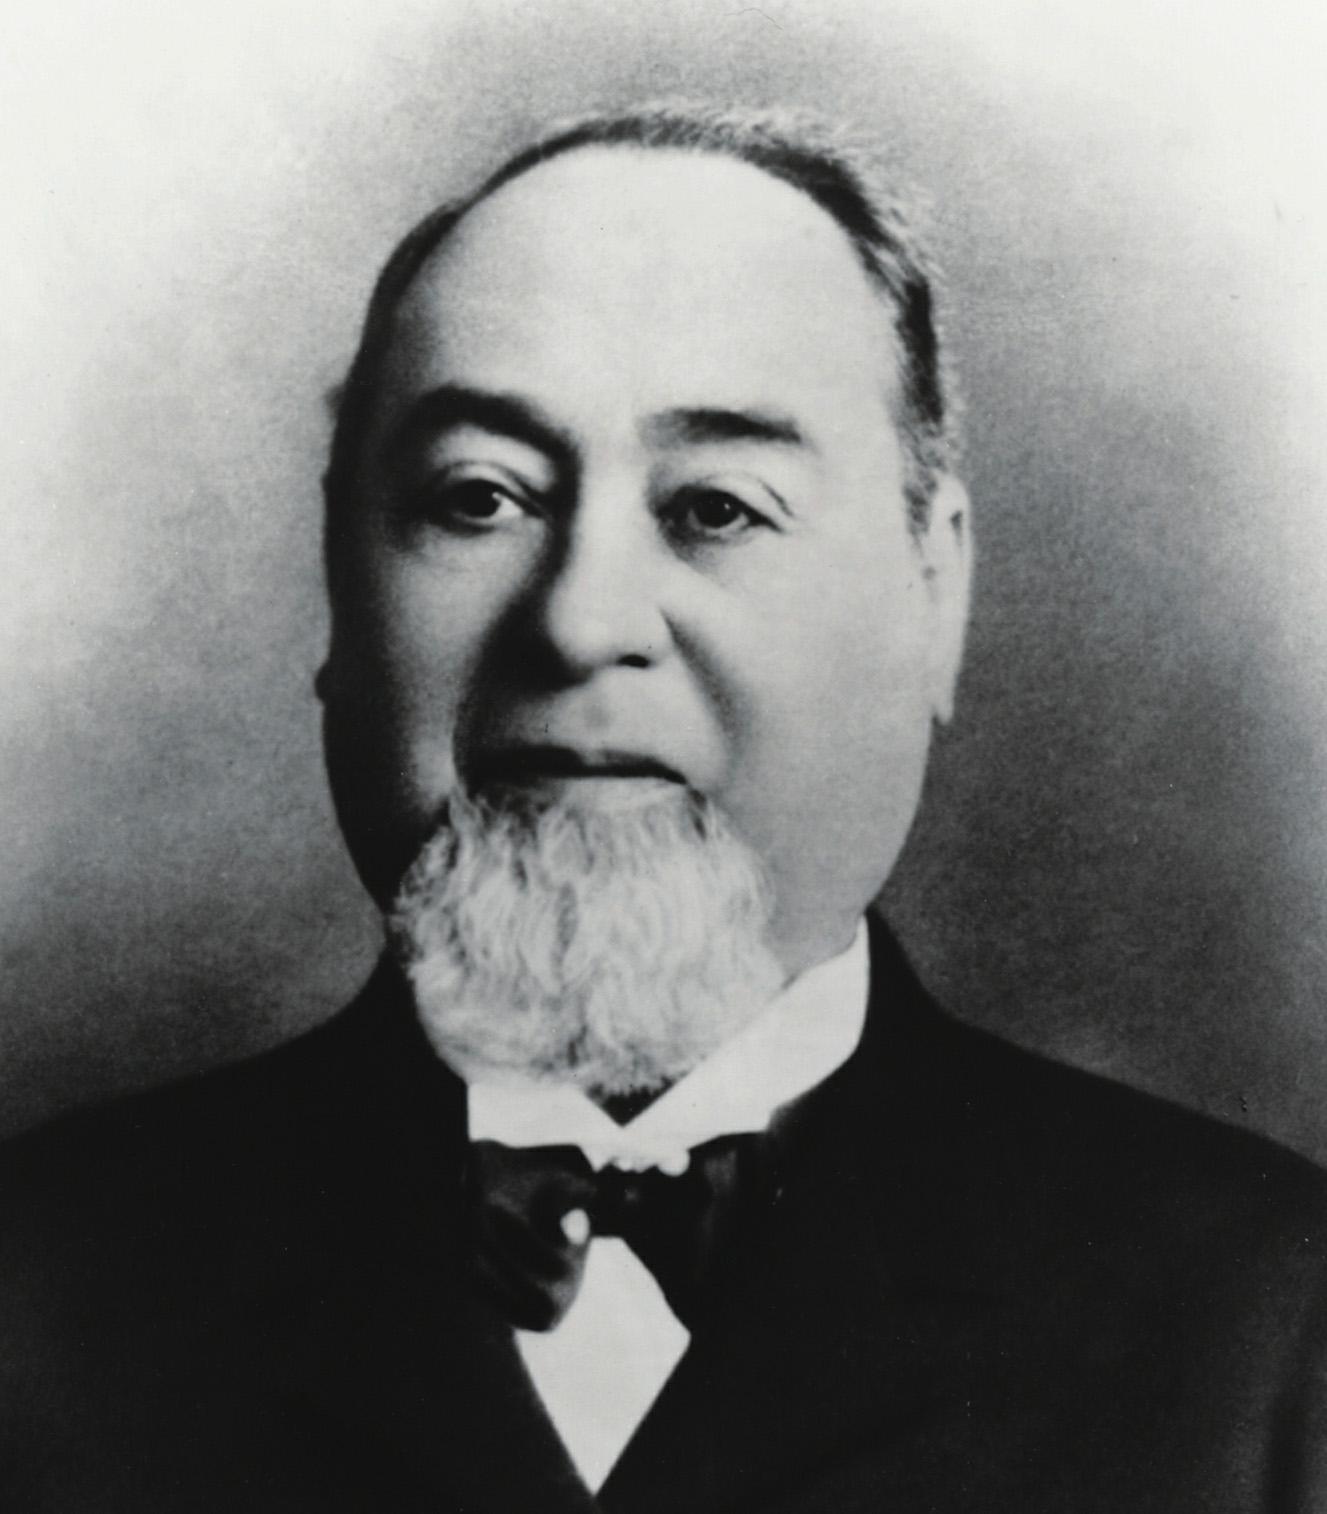 Levi Srauss